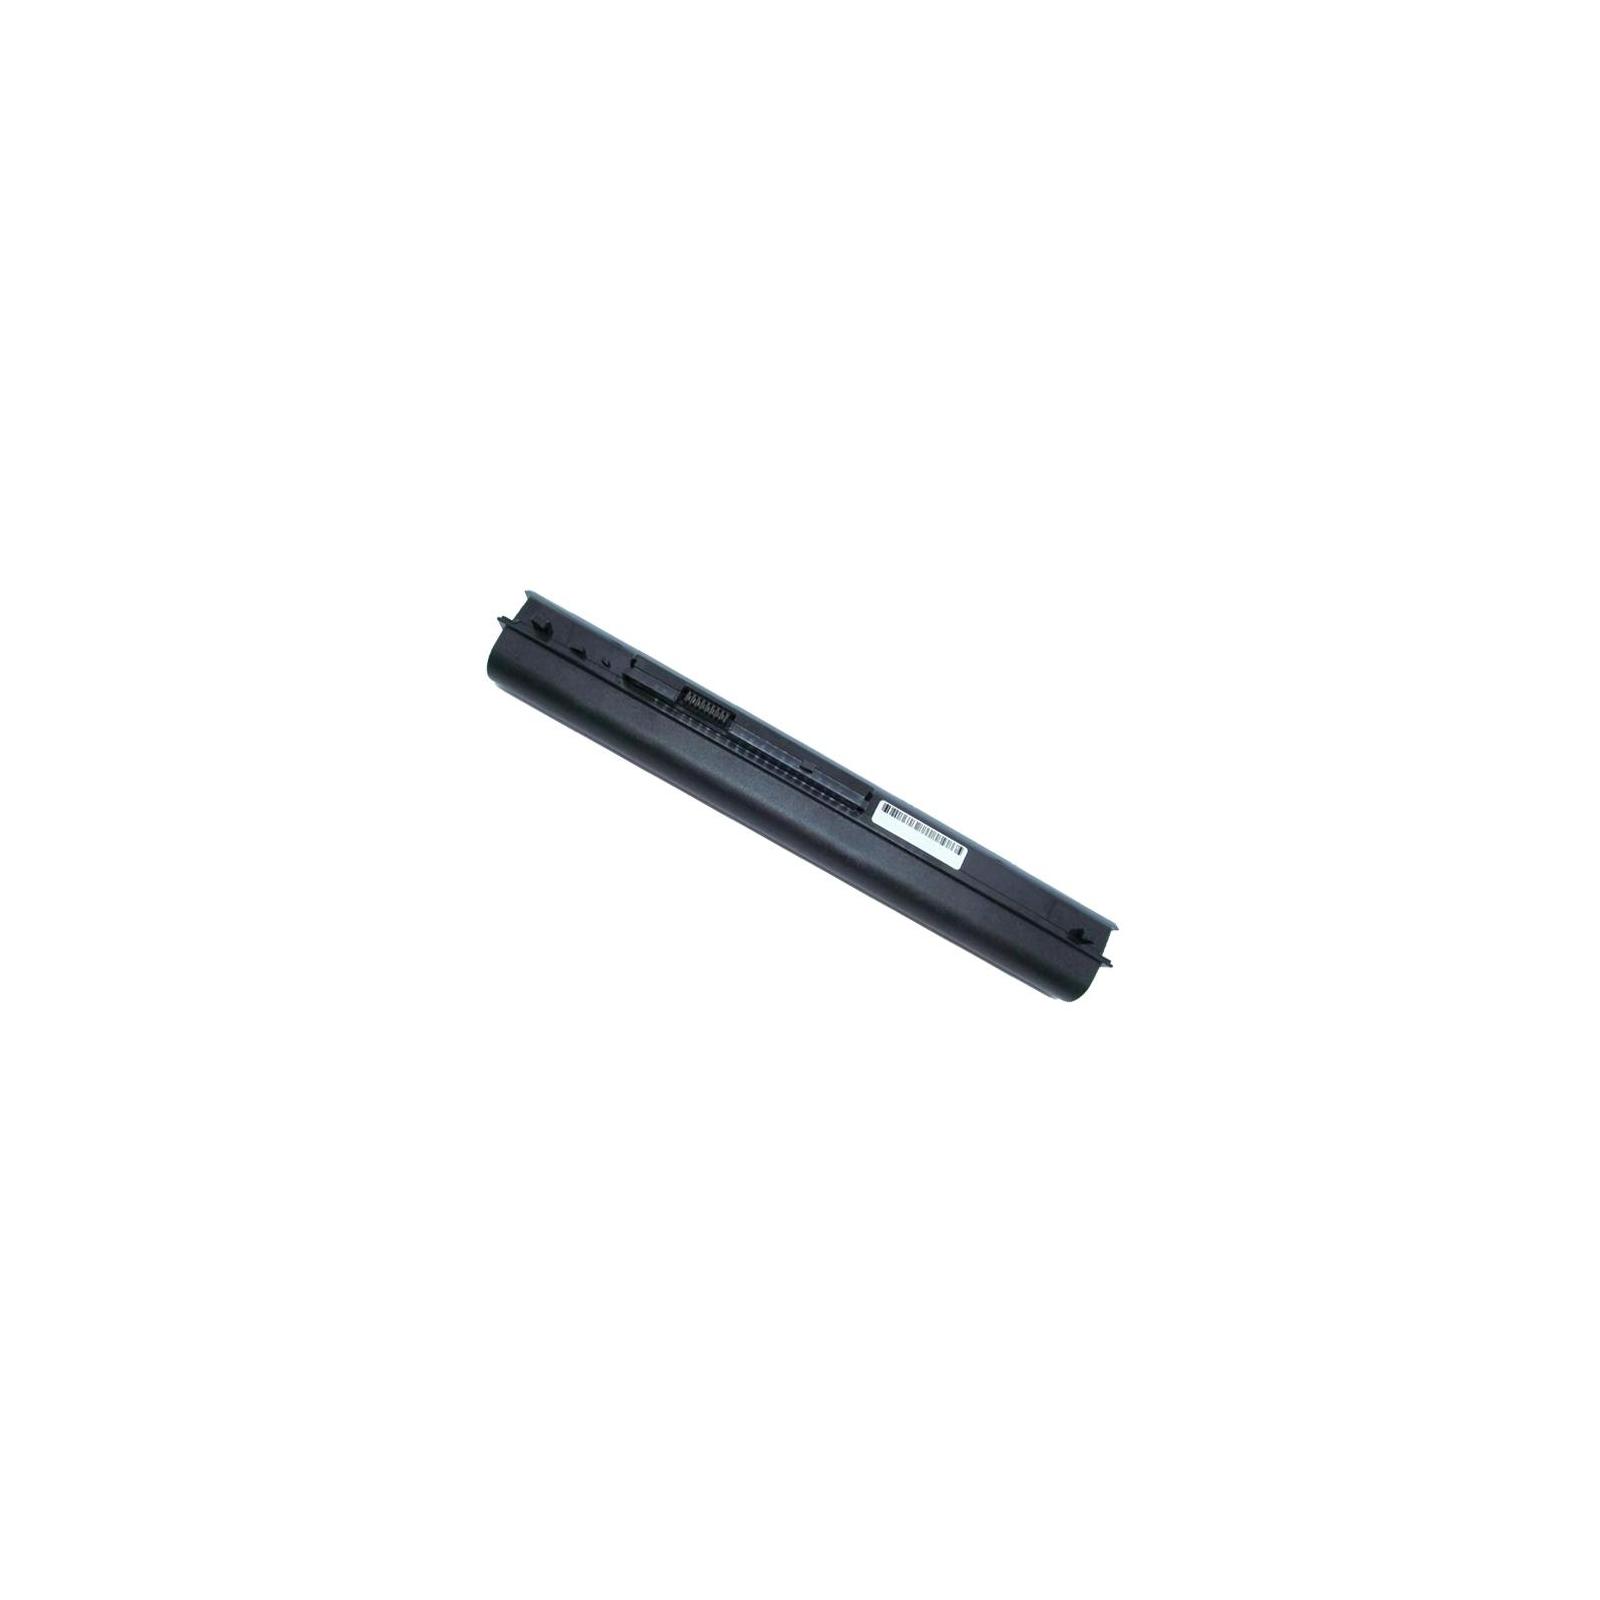 Аккумулятор для ноутбука HP 240 G2 HSTNN-LB5S, 5200mAh, 8cell, 14.8V, Li-ion (A47239) изображение 2